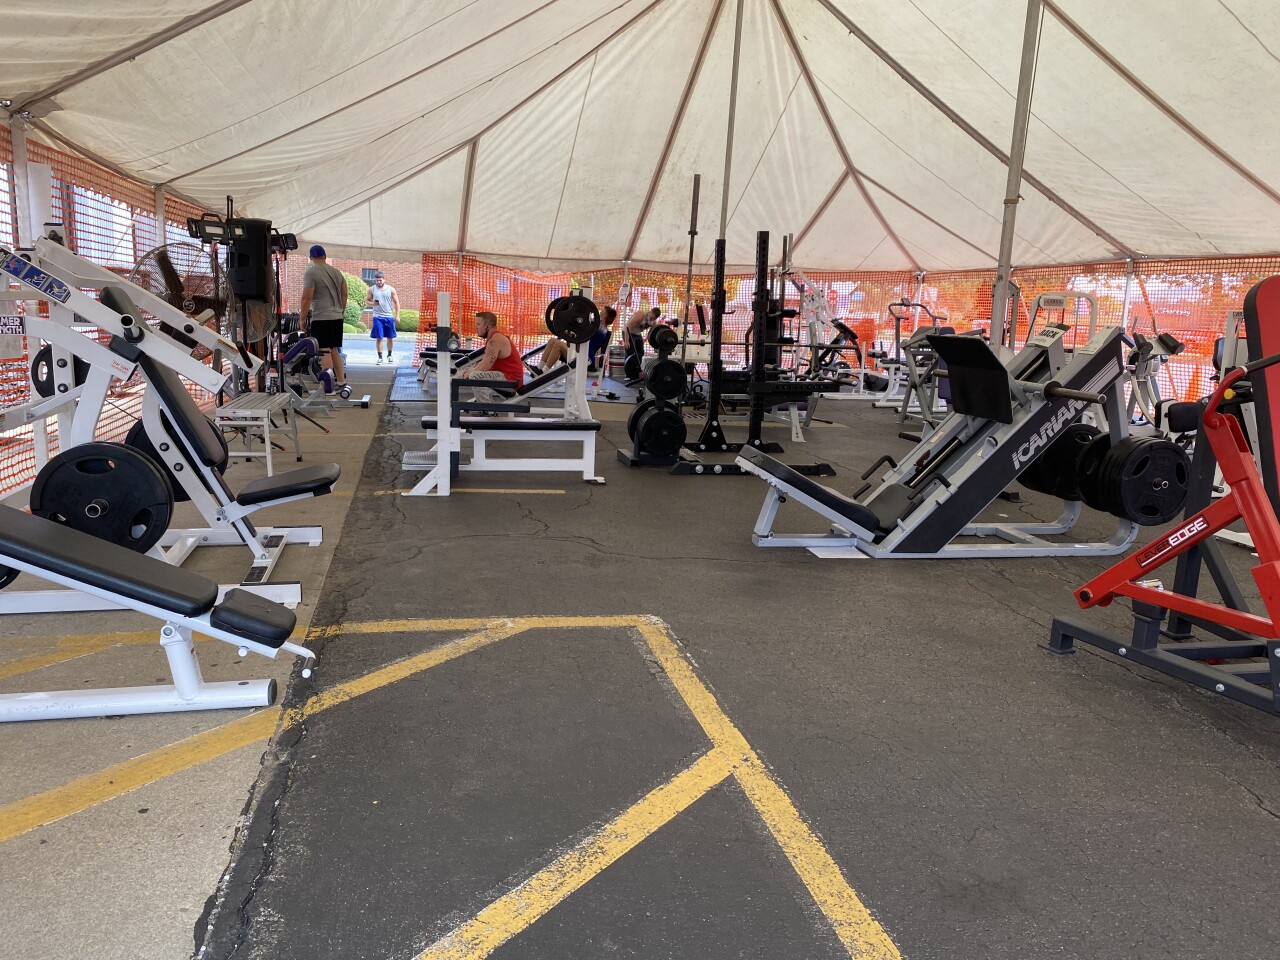 Inside the Eade Fitness 24/7 tent